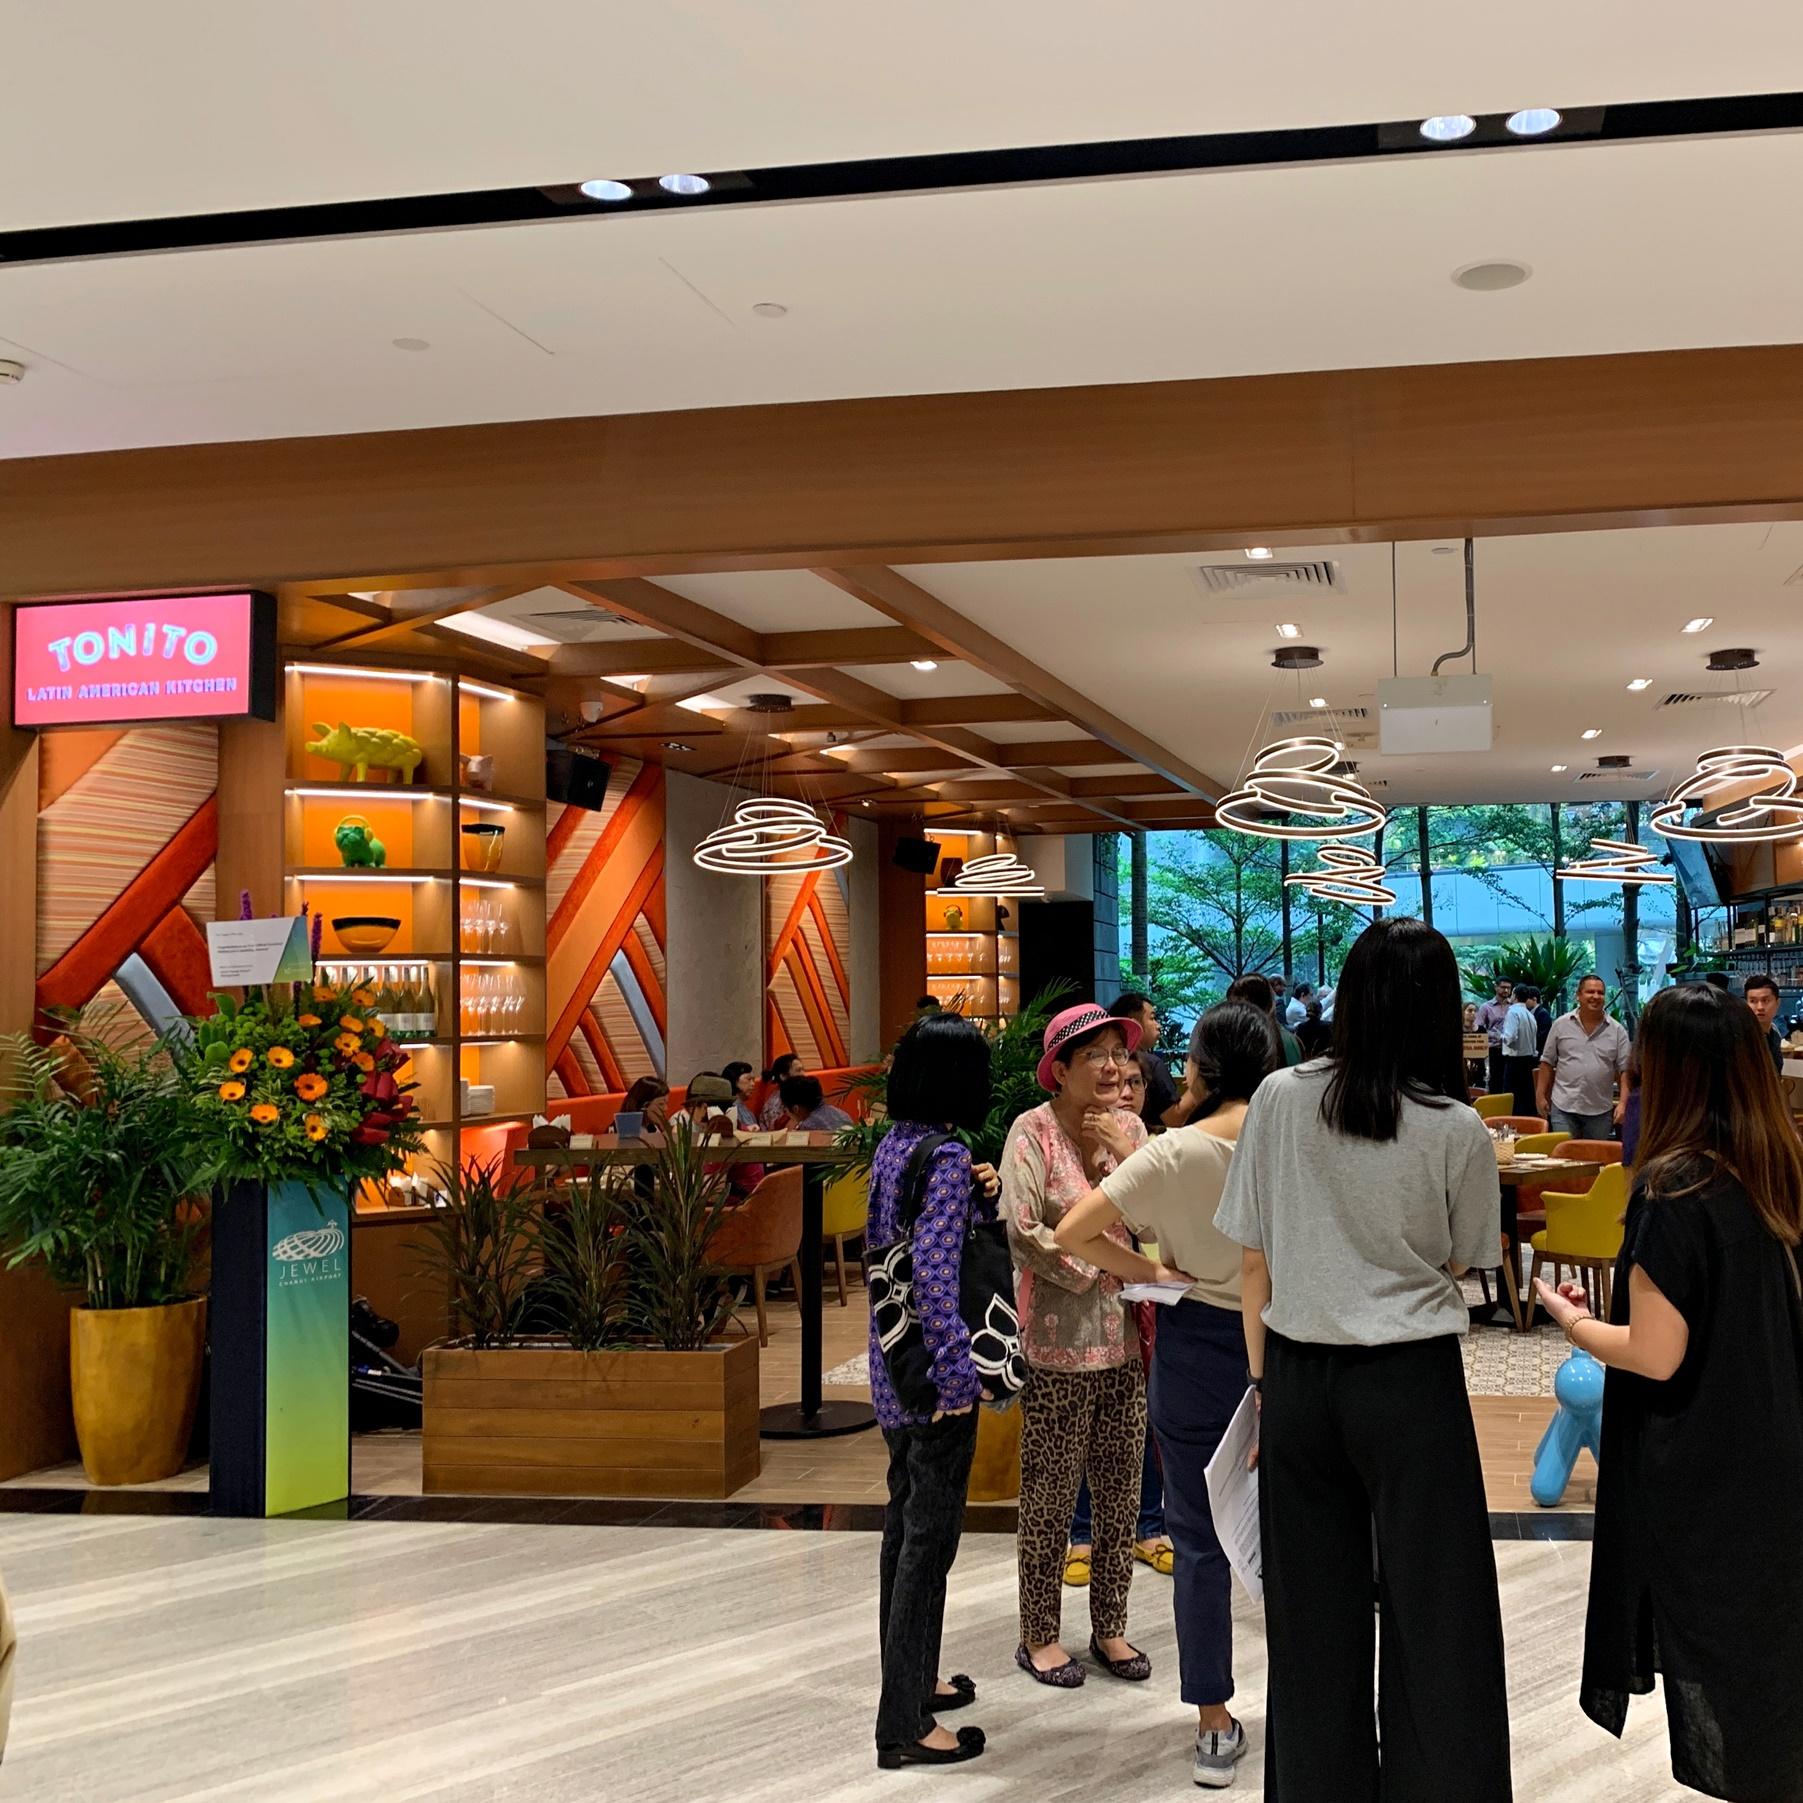 Tonito_Jewel Changi Airport